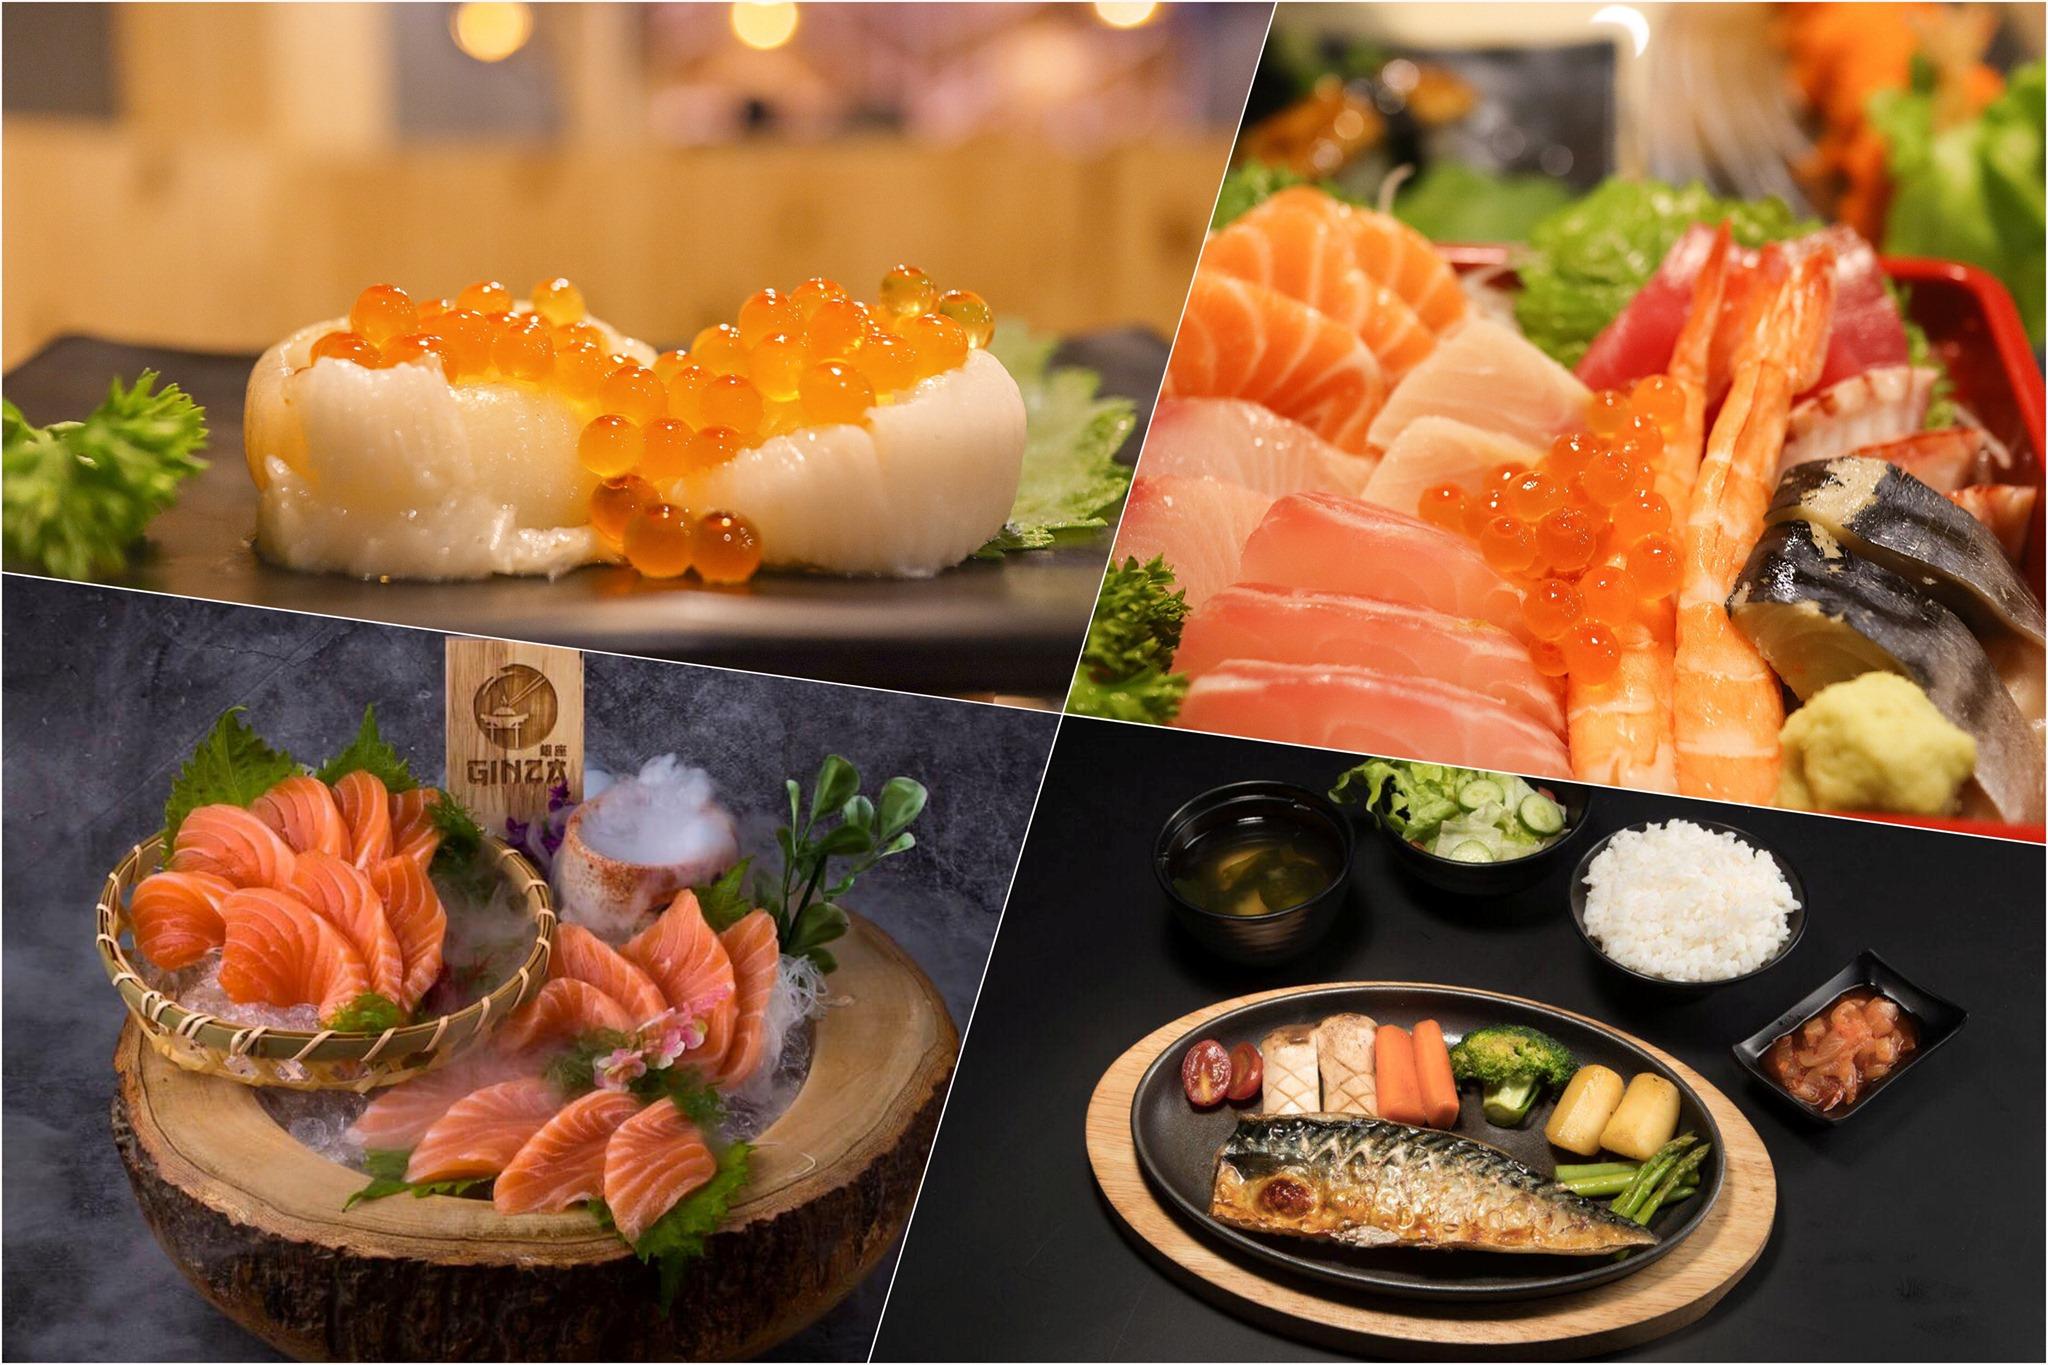 23.-Ginza-Izakaya-https://nakhonsidee.com/show/read/1/159  checkin,nakhonsithammarat,ของกิน,ร้านอาหาร,จุดเช็คอิน,ที่เที่ยว